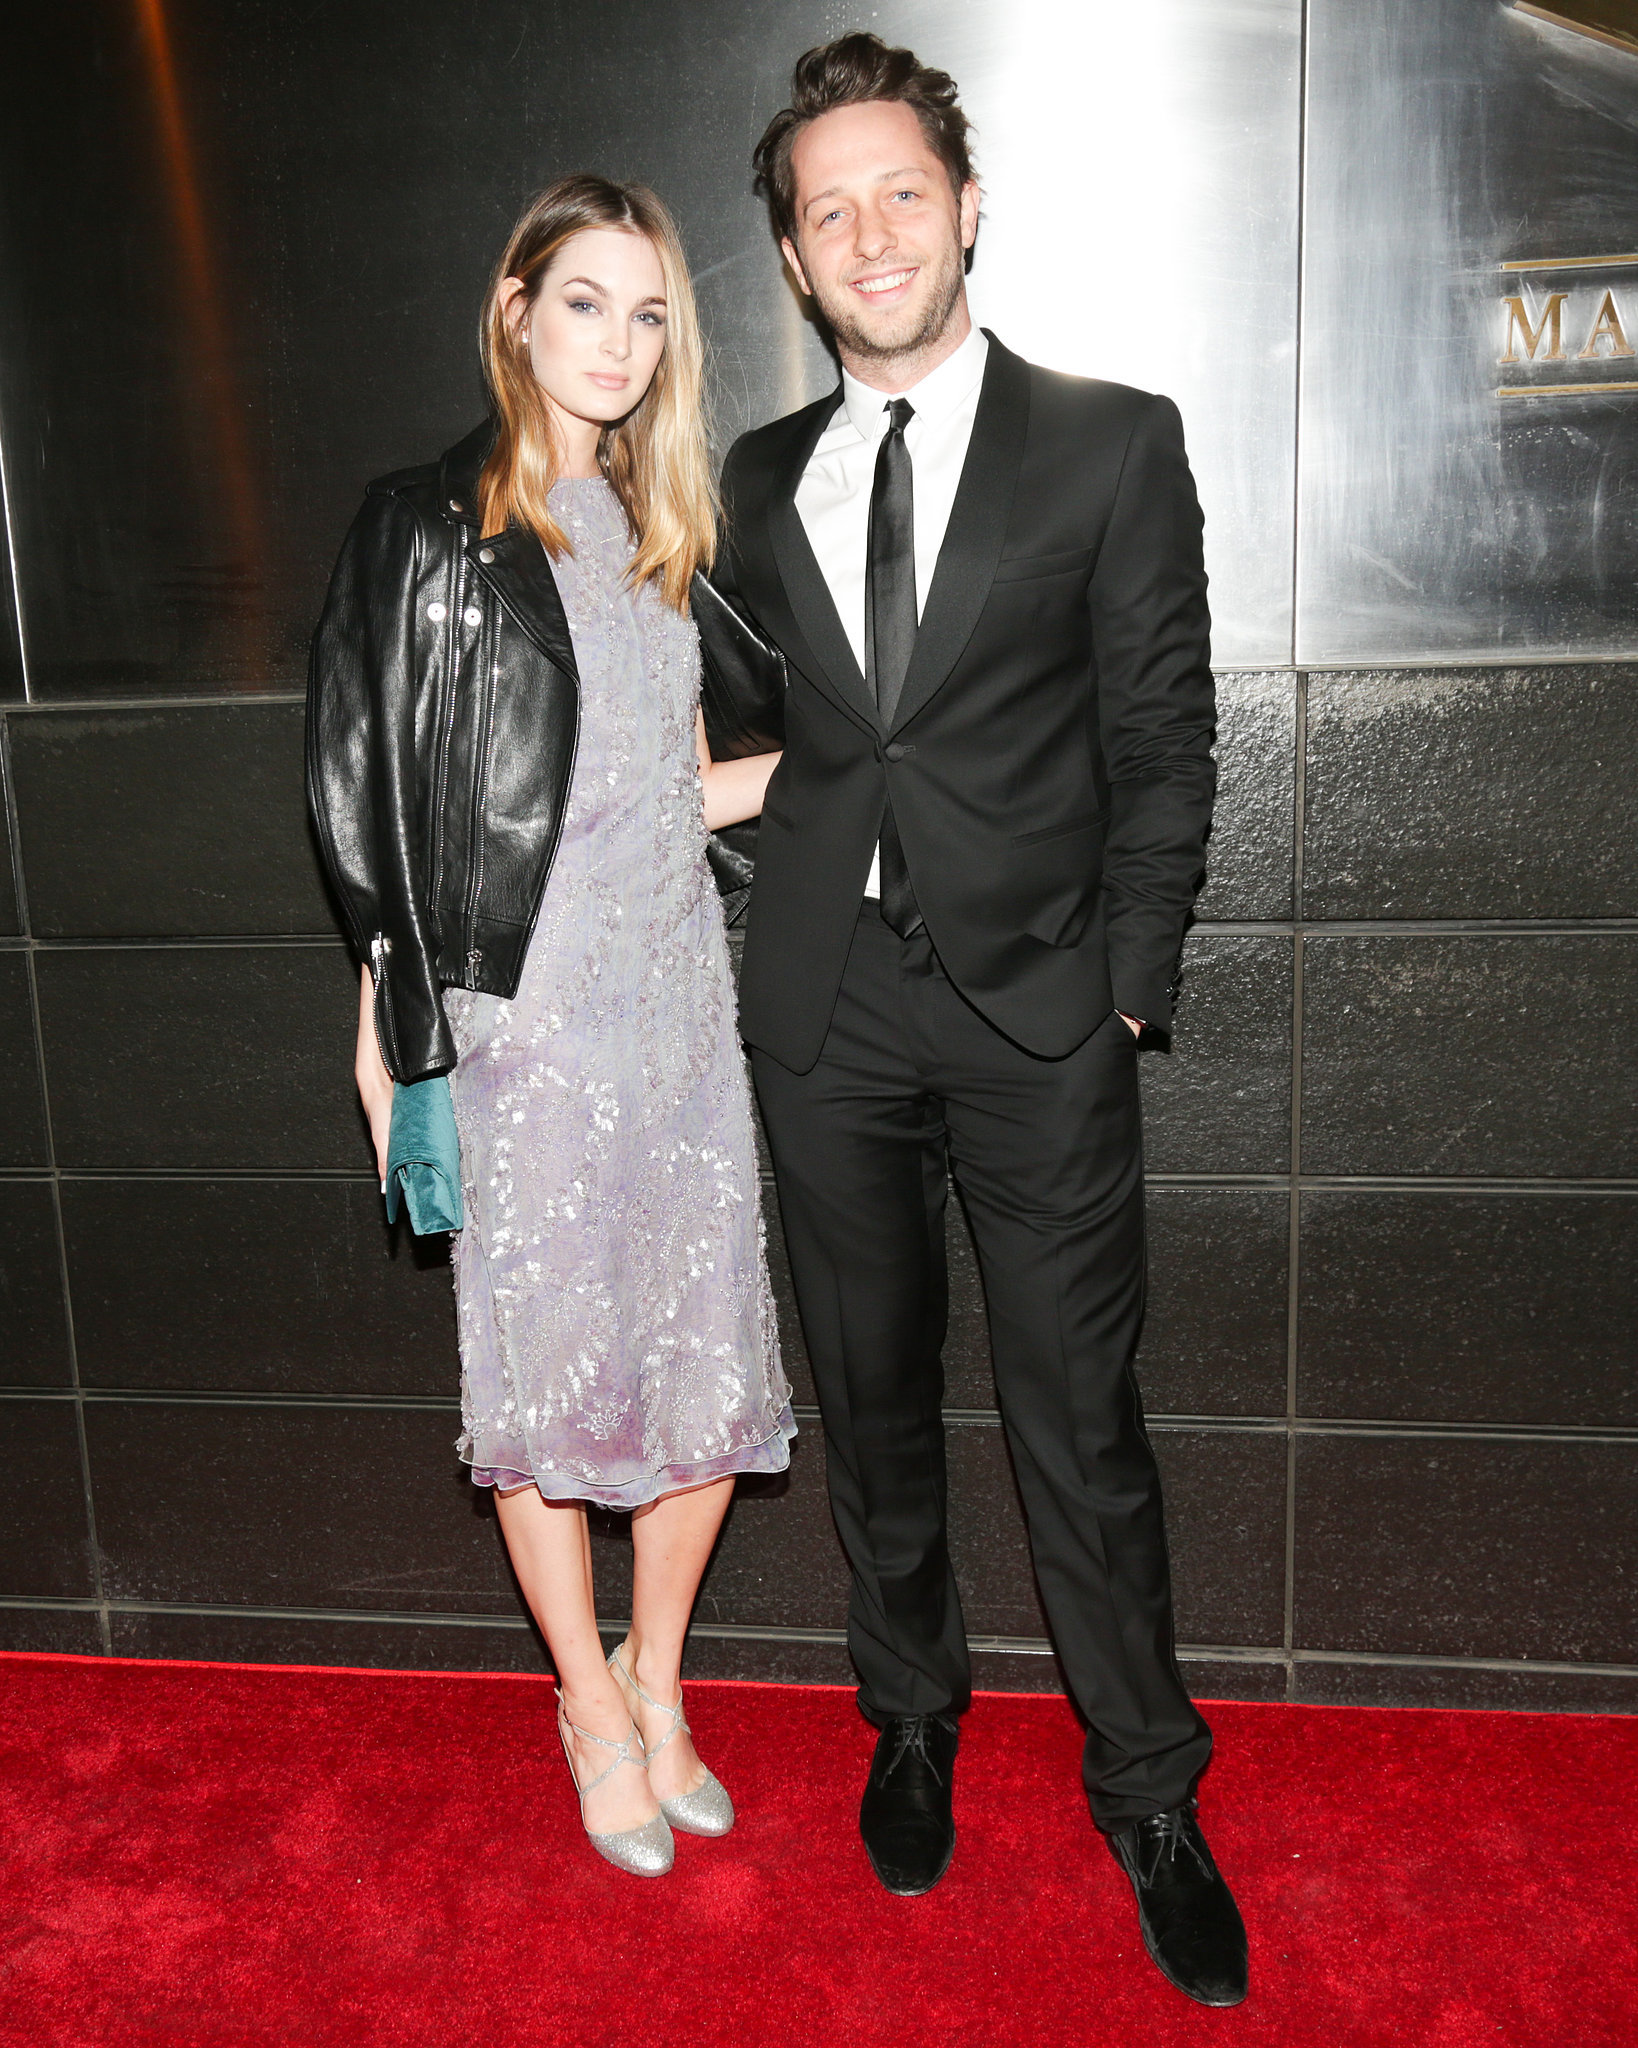 Laura Love and Derek Blasberg